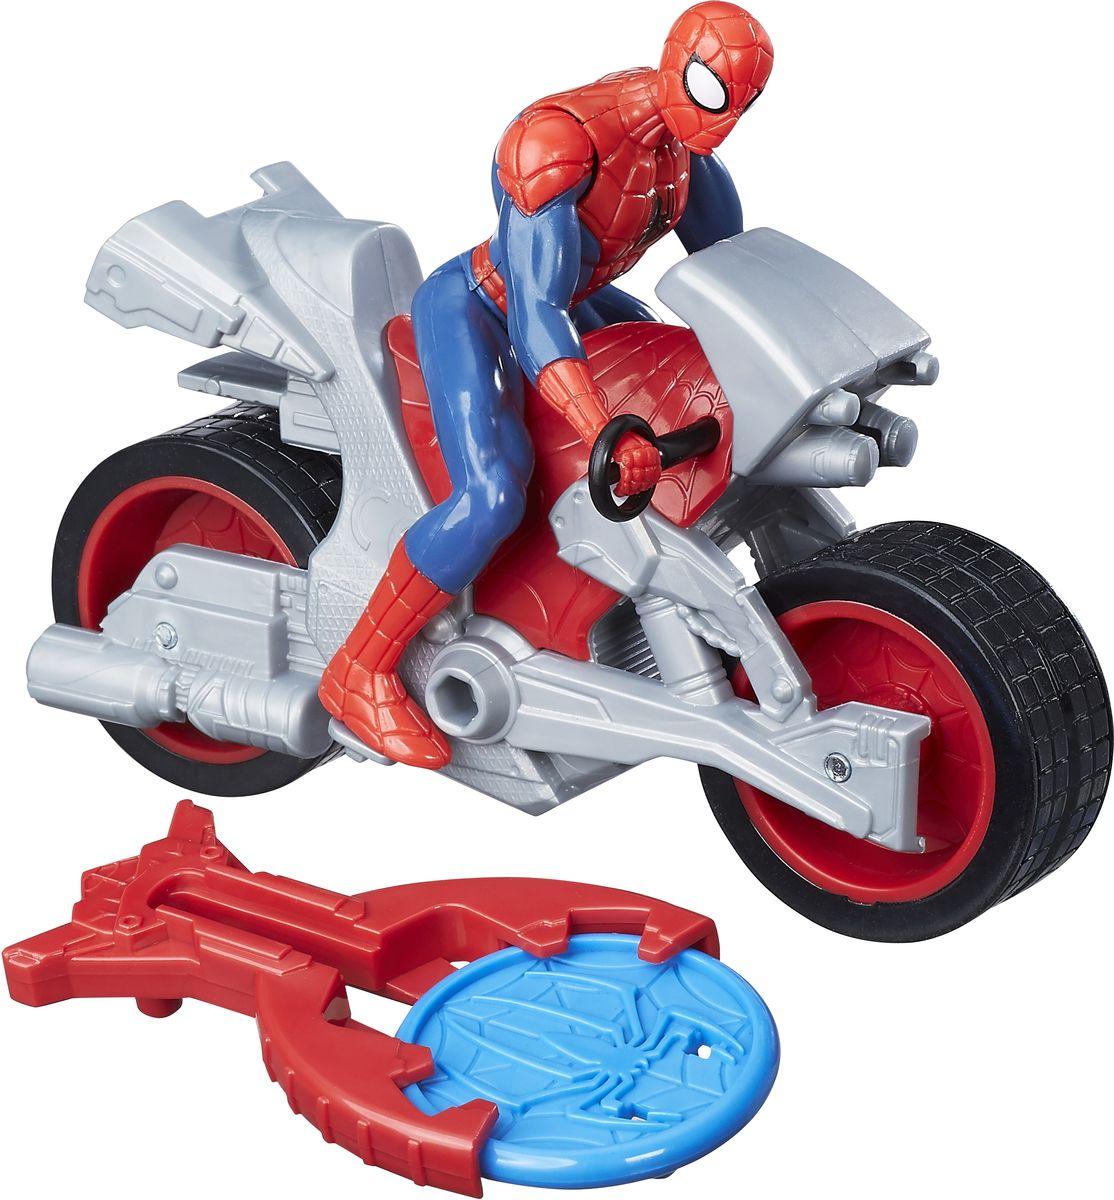 Spider-Man ФигуркаЧеловек-паук на мотоцикле spider man игрушка фигуркачеловек паук и мотоцикл